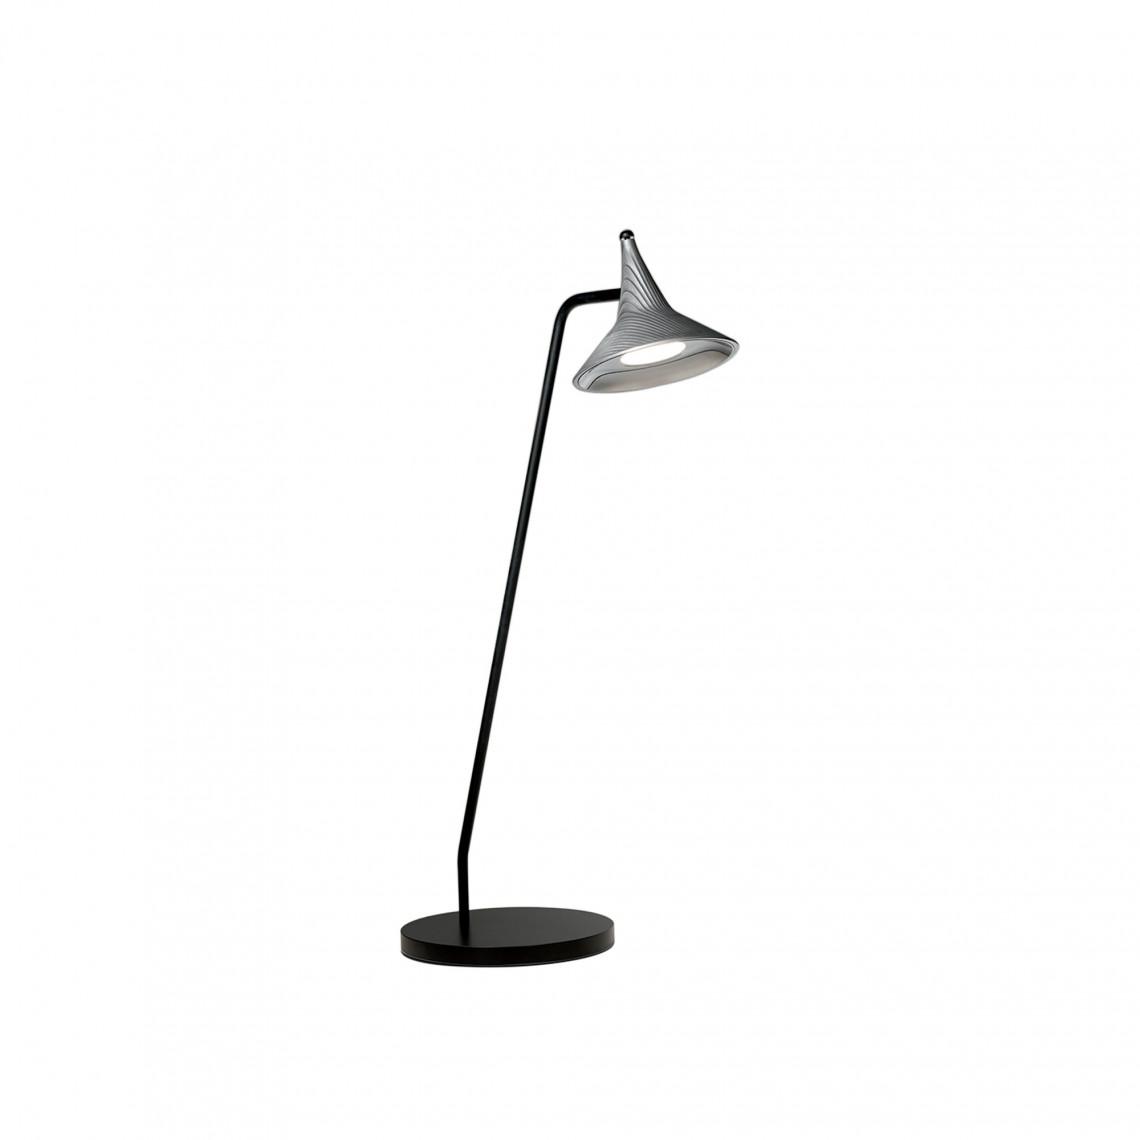 Unterlinden Bordslampa Antik Aluminium